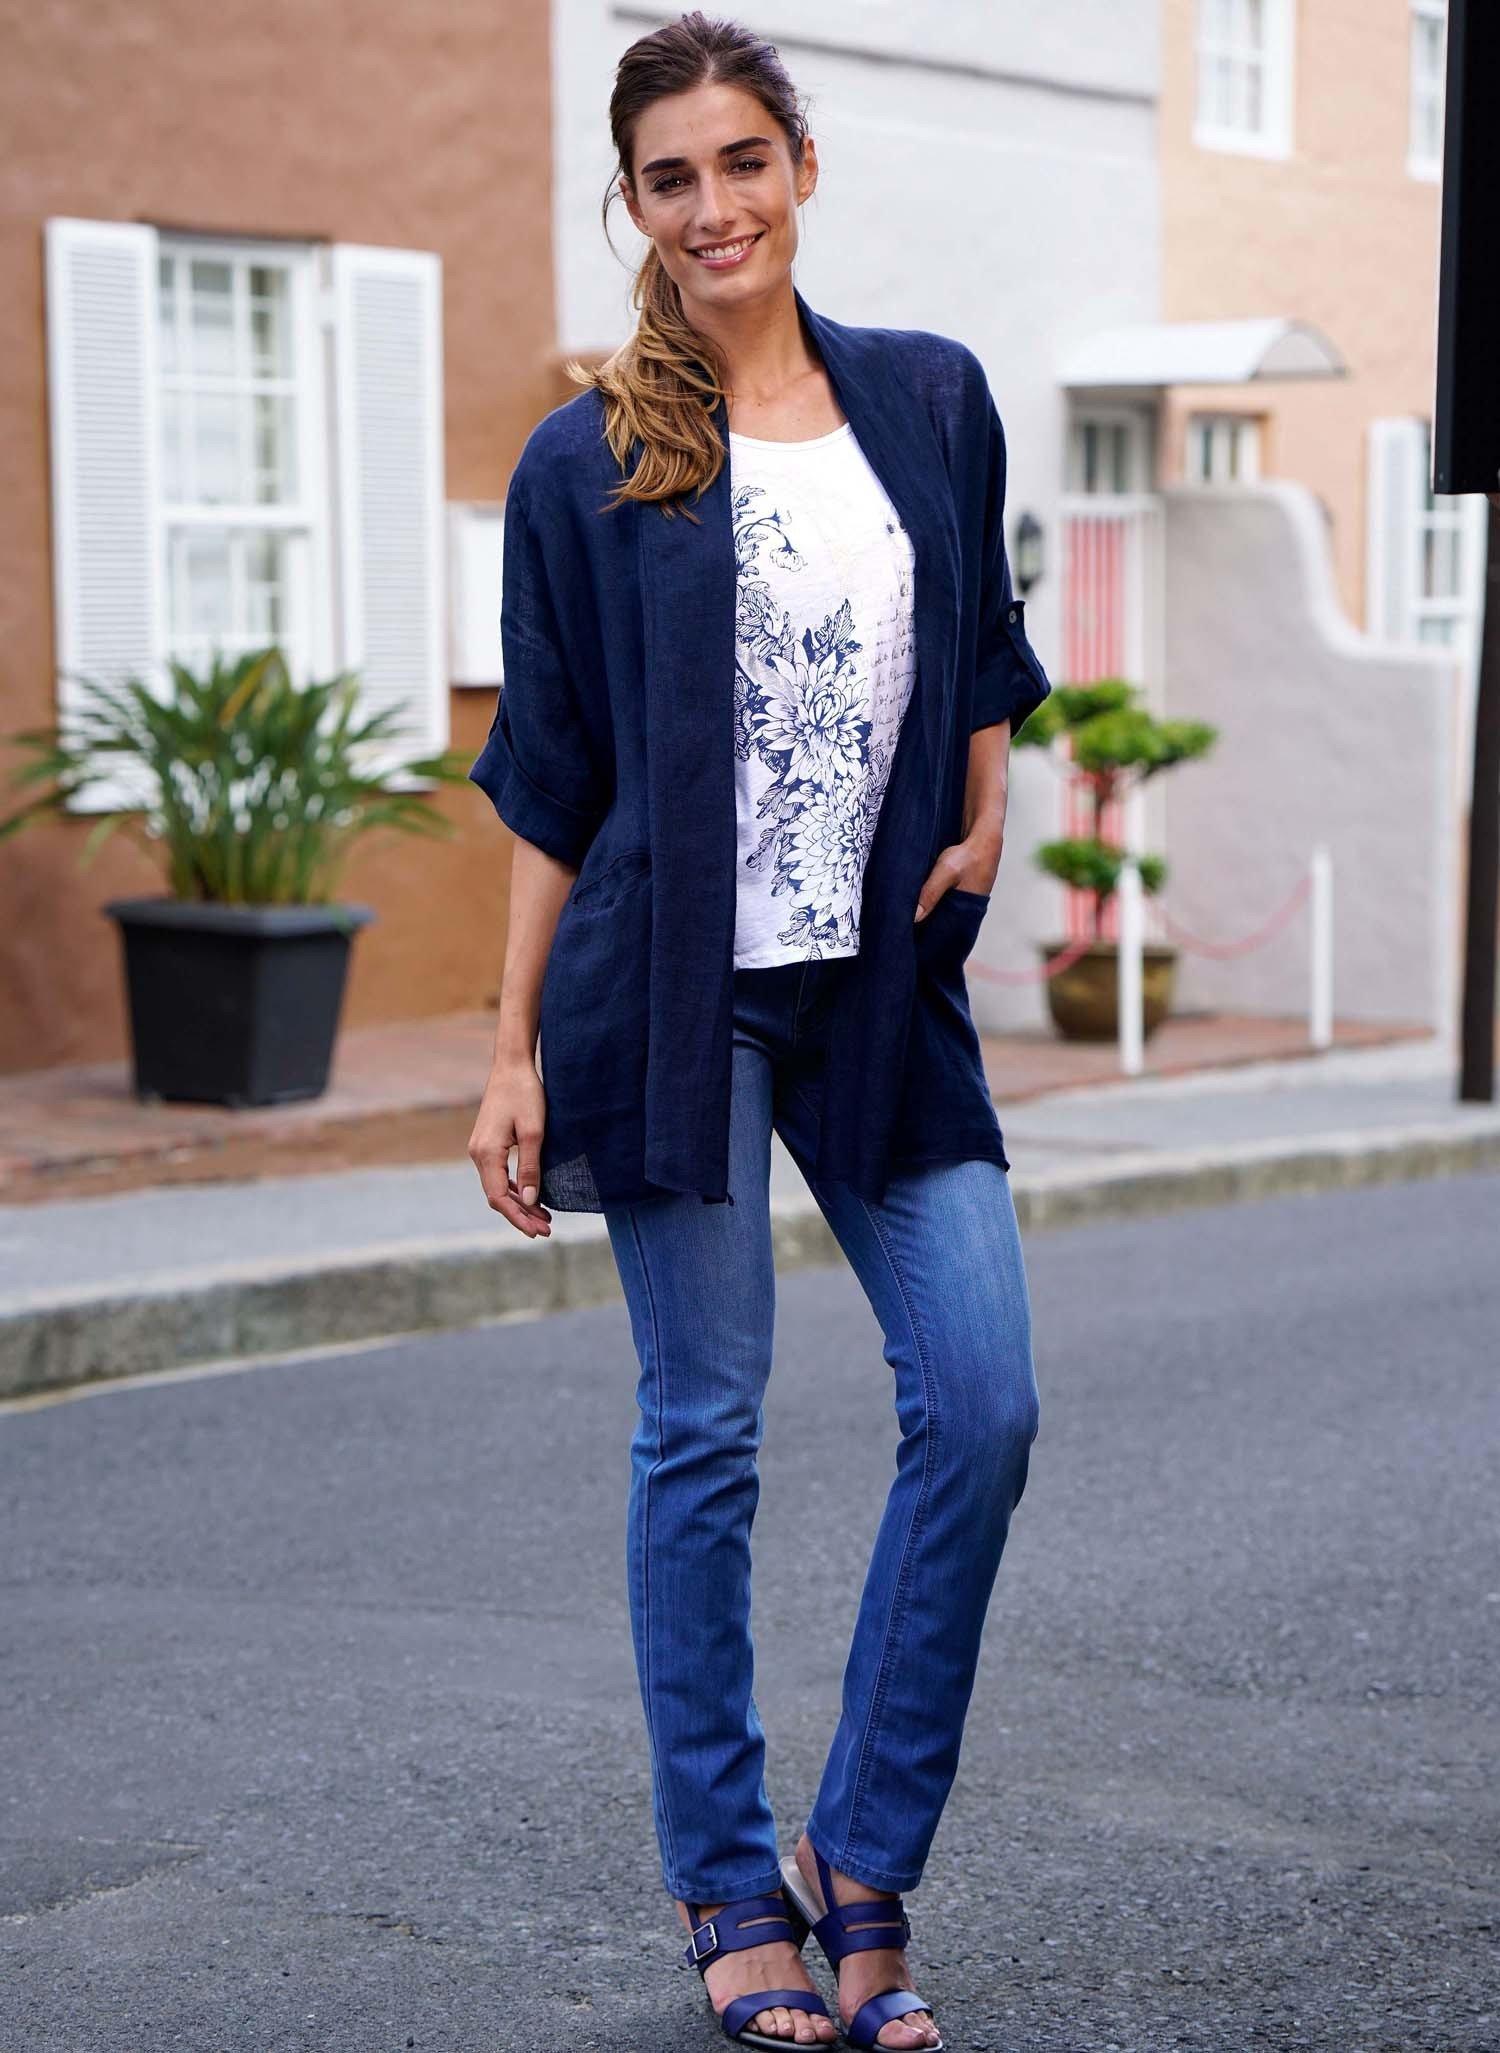 D-5P-Jeans,Ethno Blue Denim L 050 - 1 - Ronja.ch